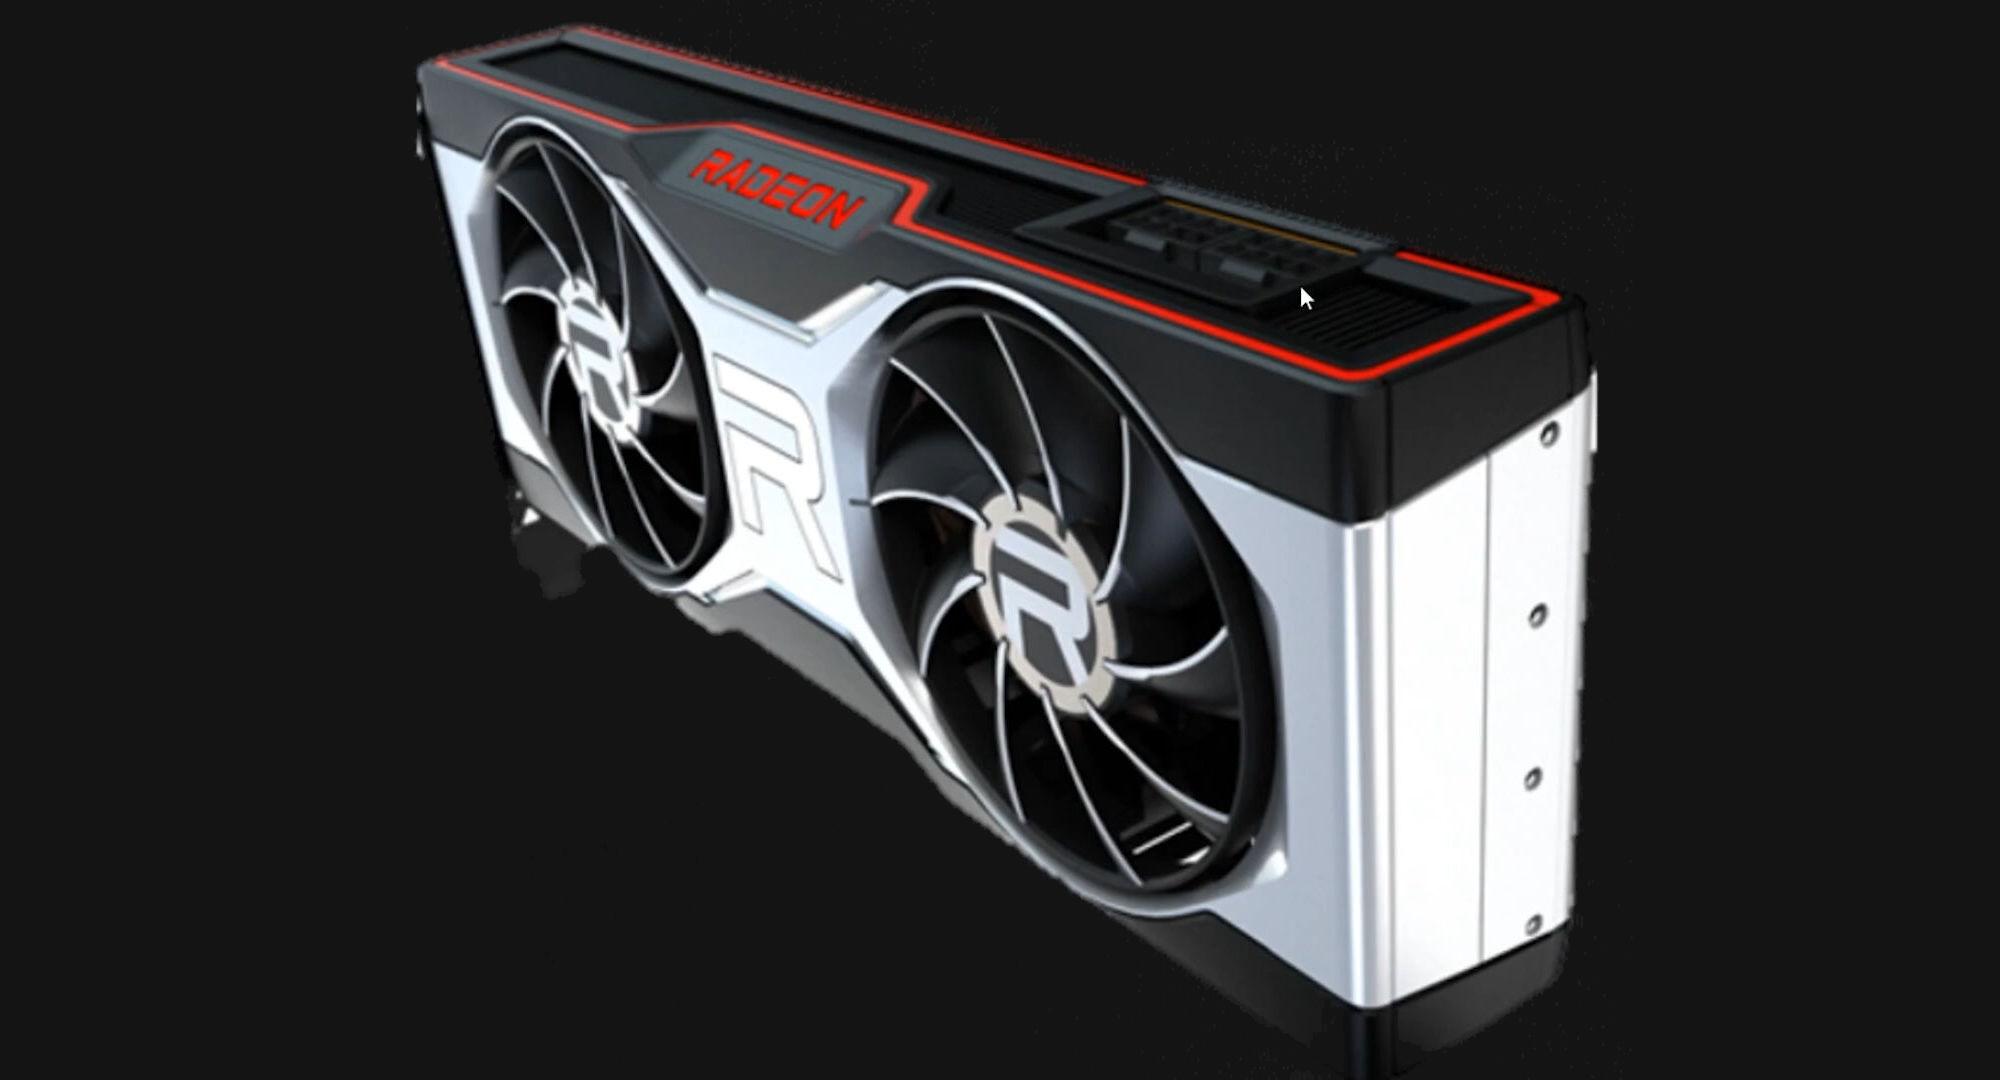 Появились фото видеокарт ASUS Radeon RX 6700 XT TUF Gaming и DUAL